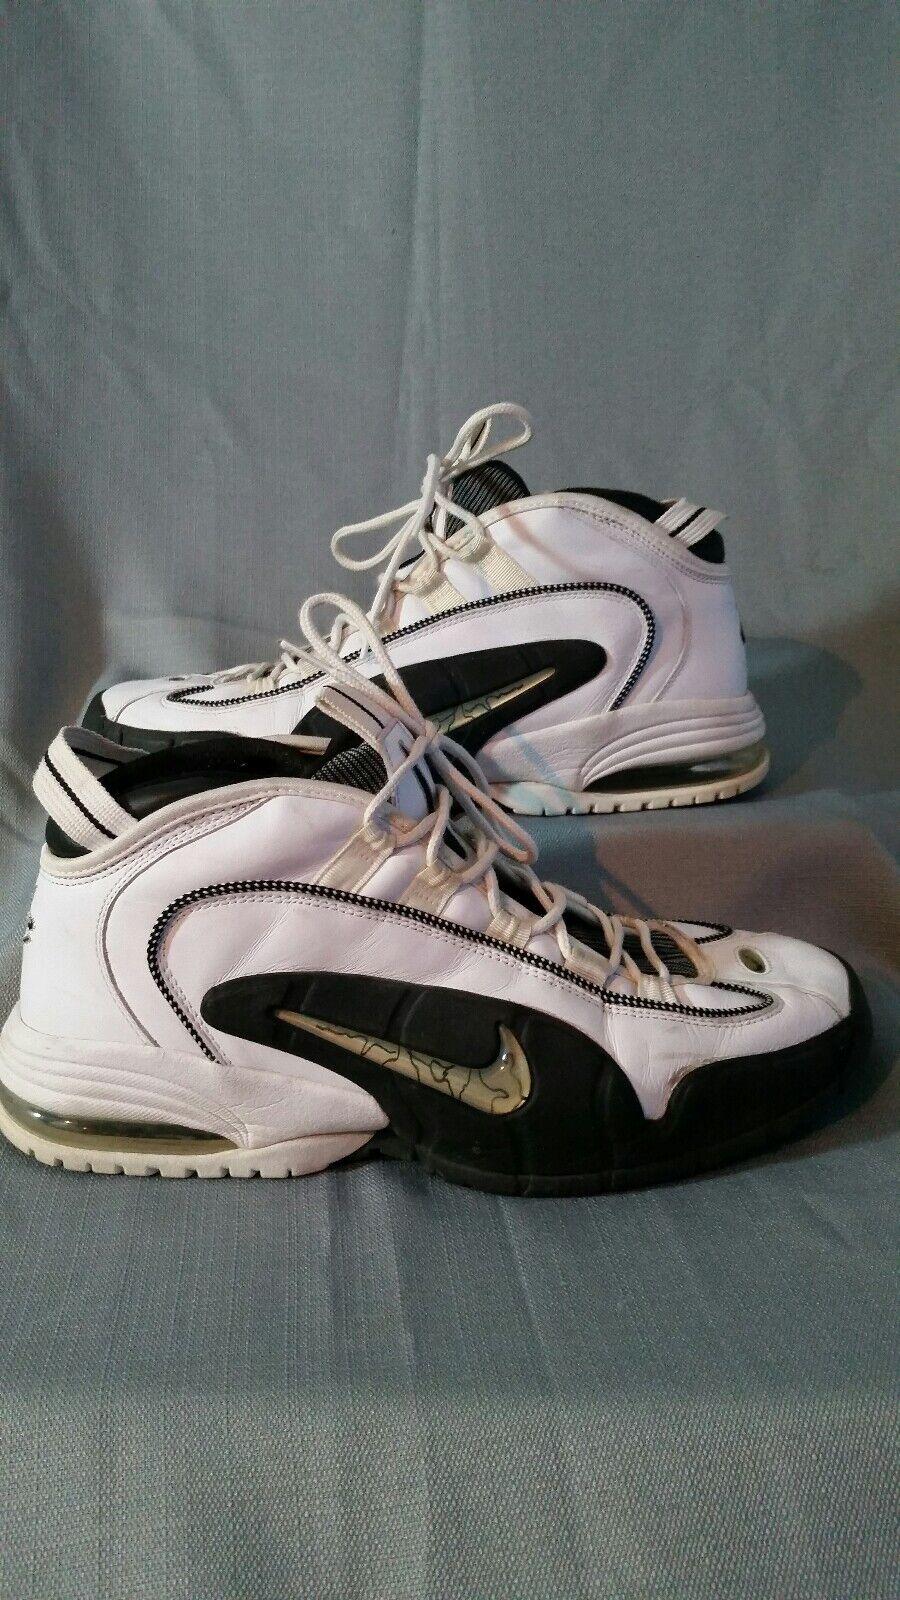 Nike air max penny 1 rara!bianco nero argento numero 13 '